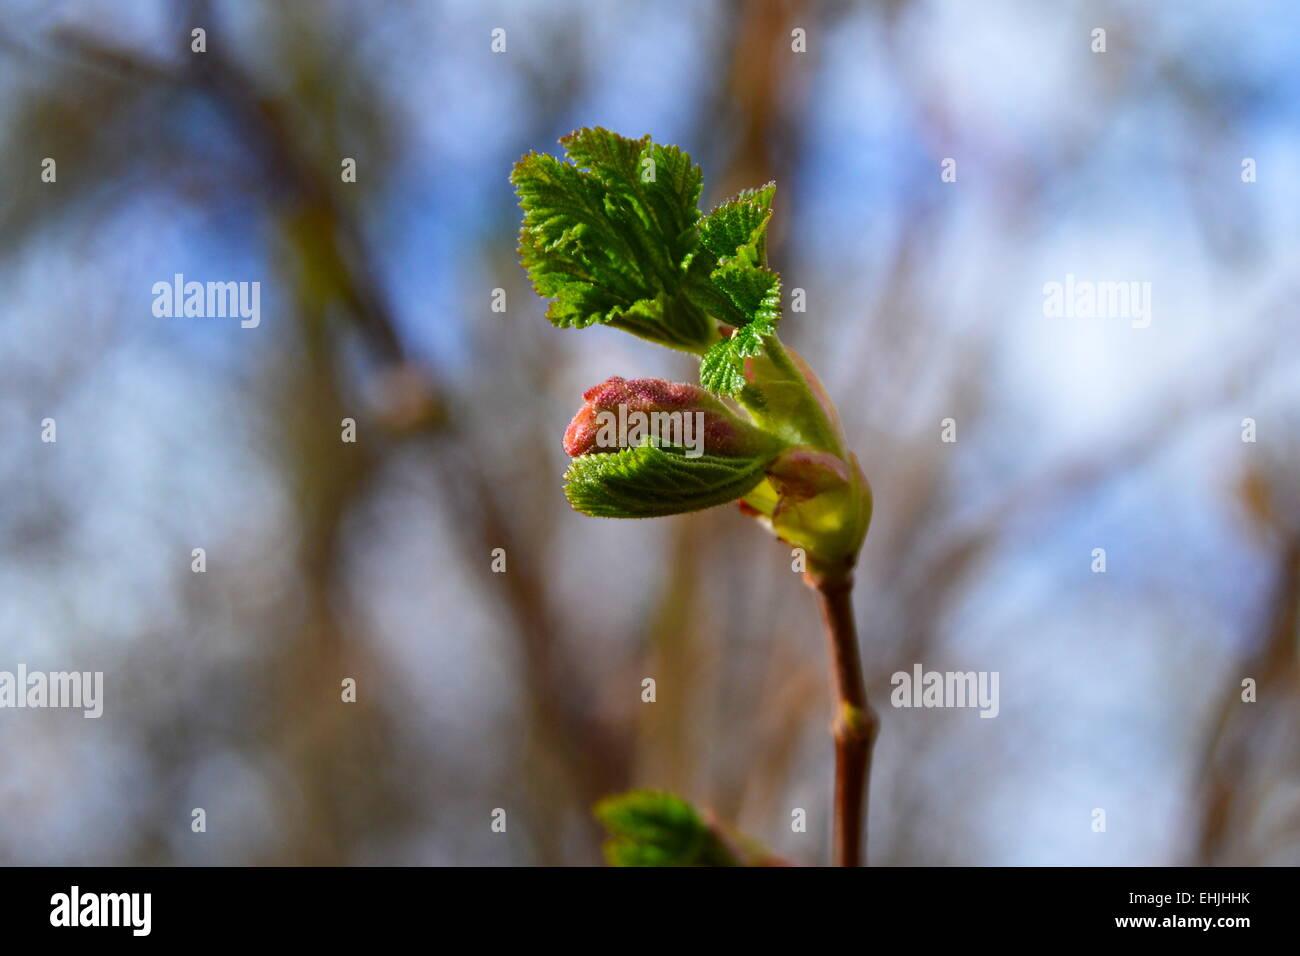 Hornbeam (Carpinus betulus) buds opening in Spring. - Stock Image